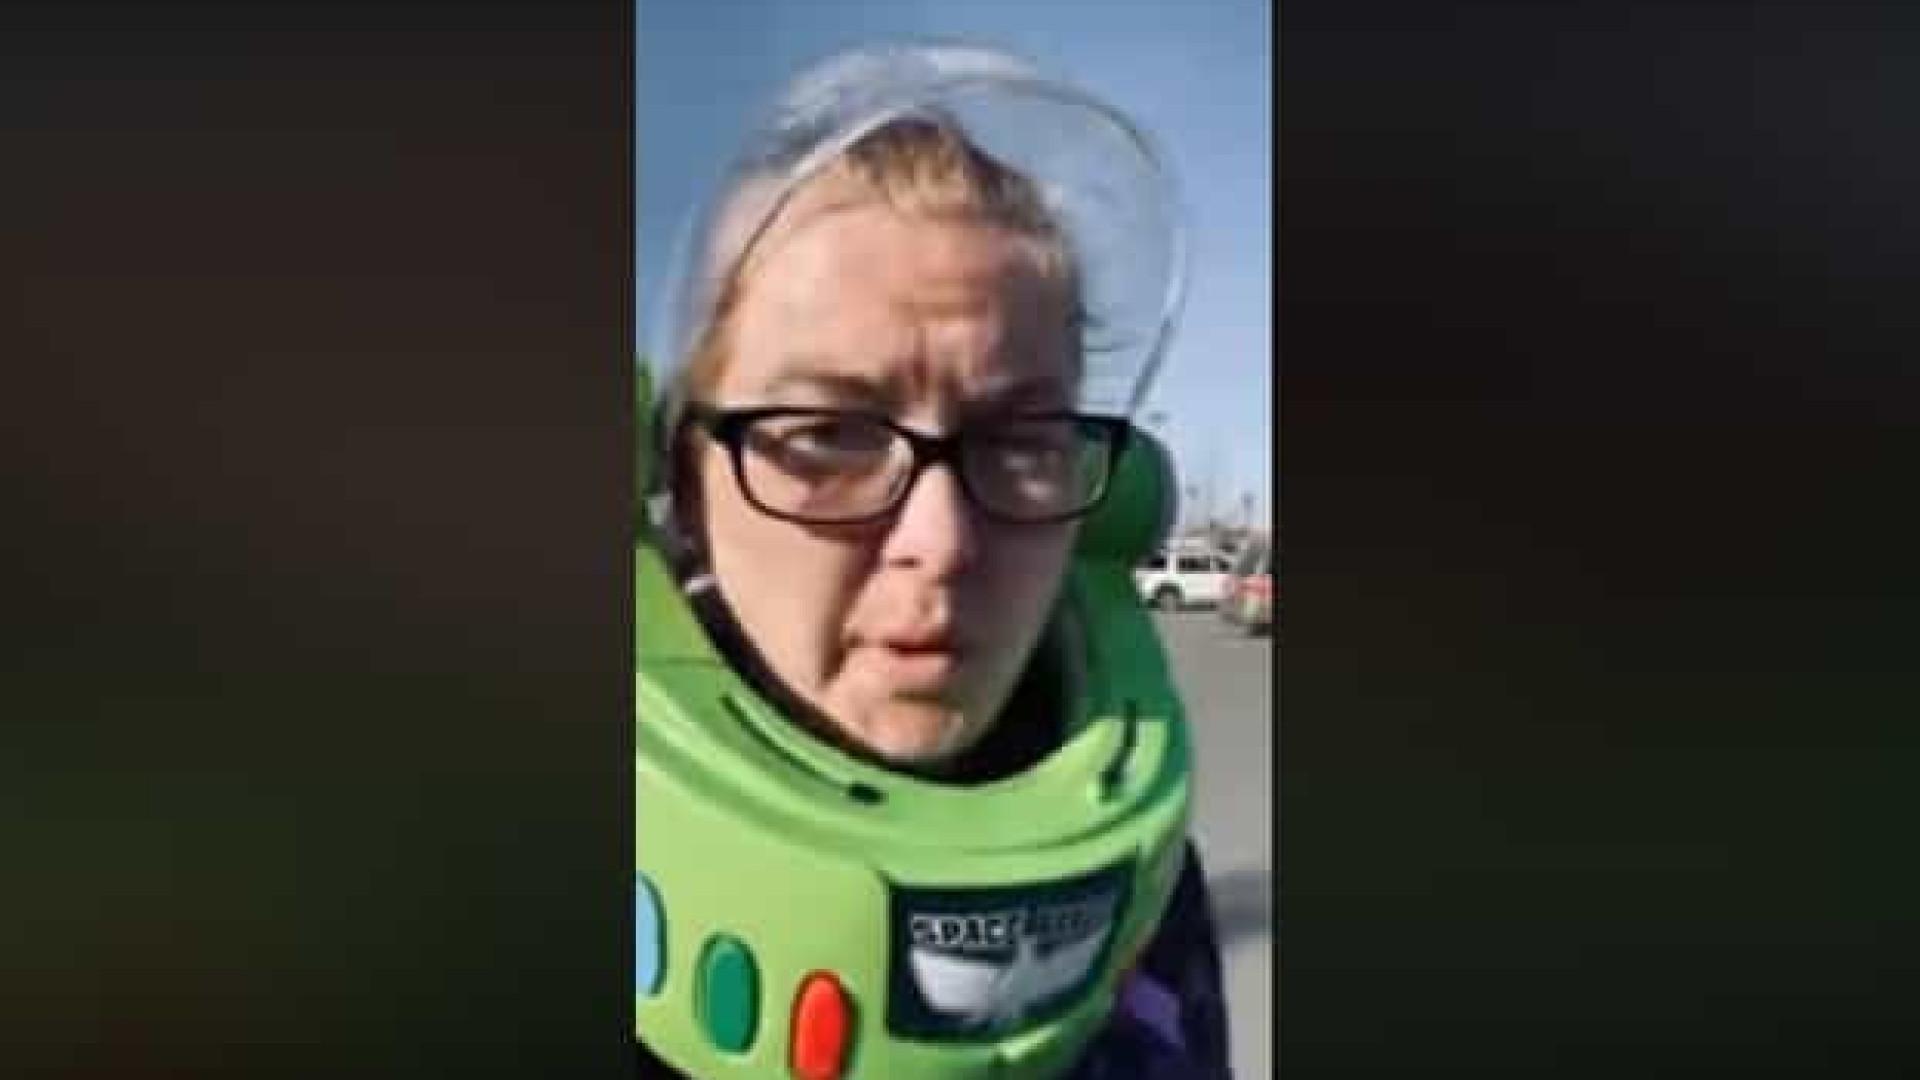 Sem máscara, mãe usa capacete do Buzz Lightyear para ir às compras